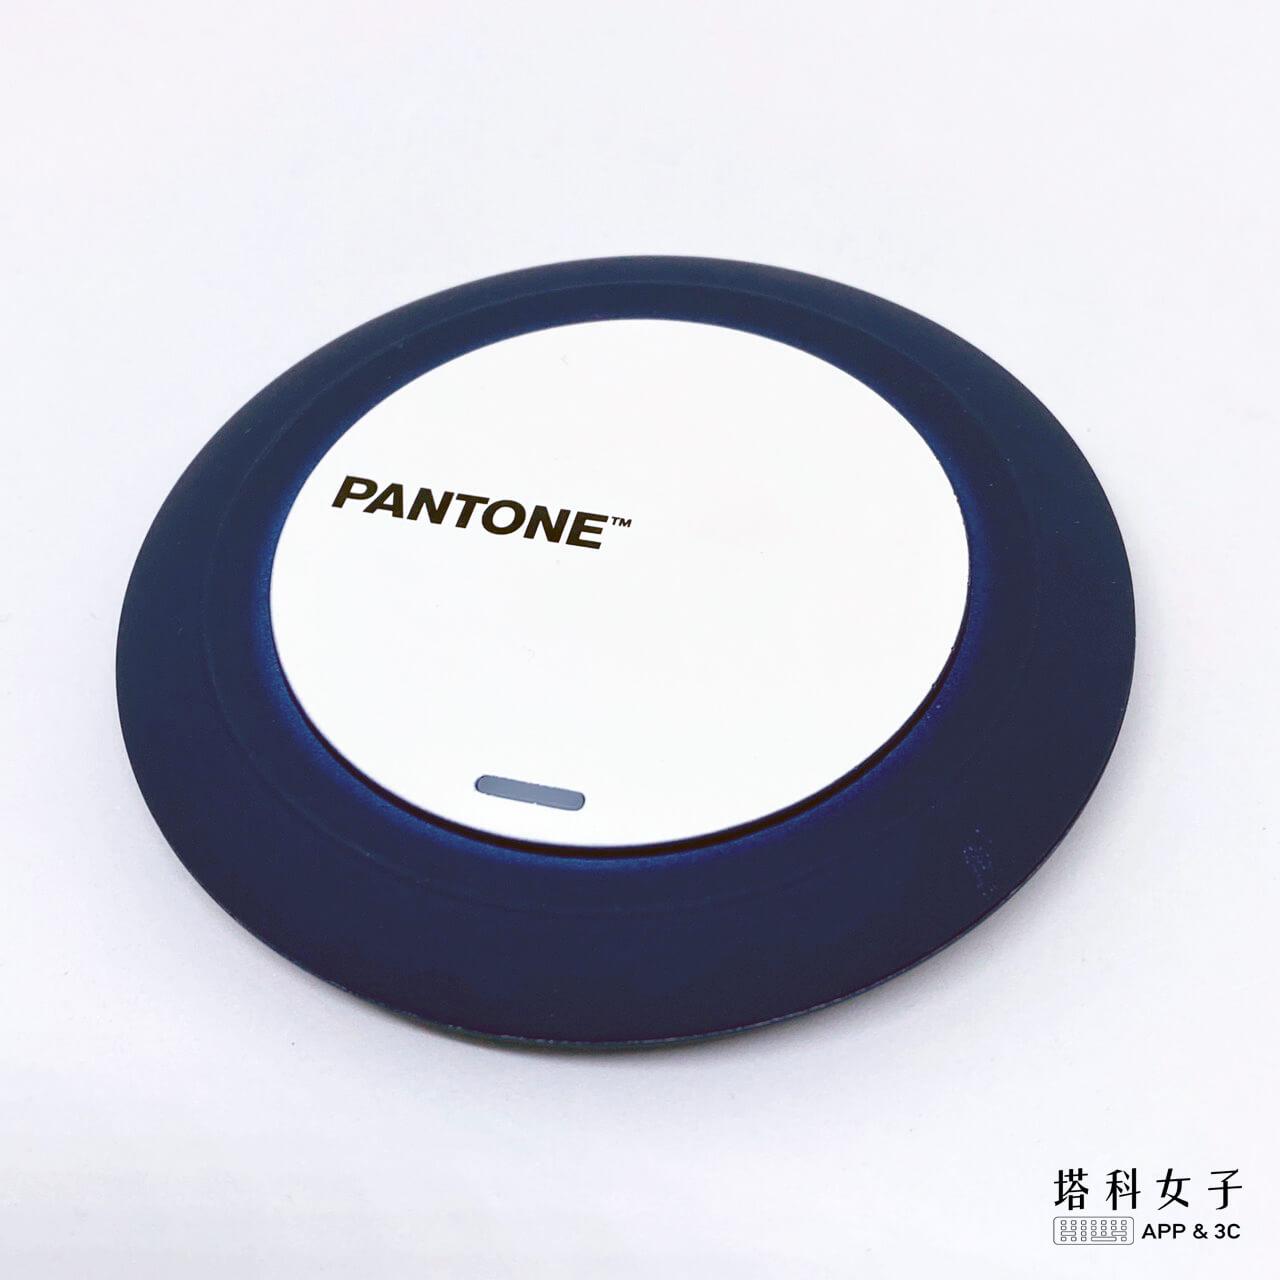 Pantone  無線充電盤開箱